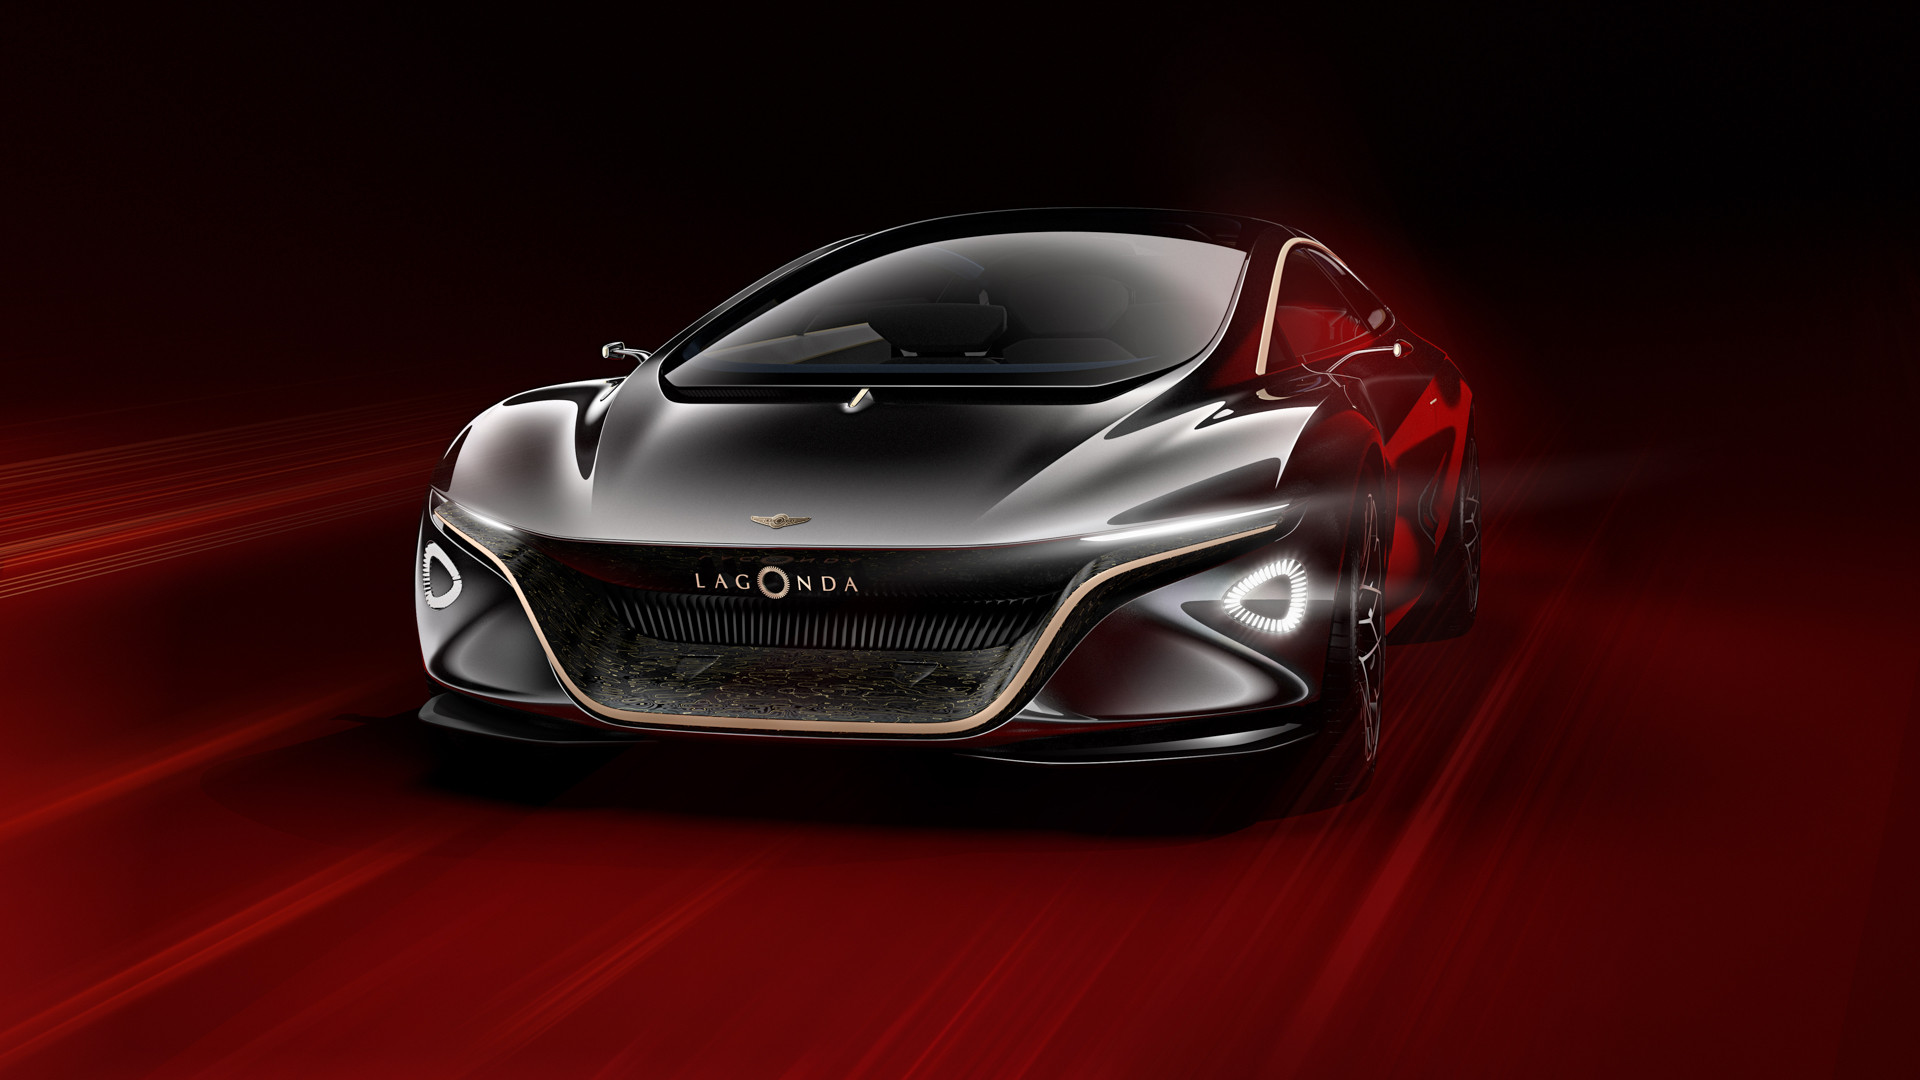 Lagonda Vision Concept 2